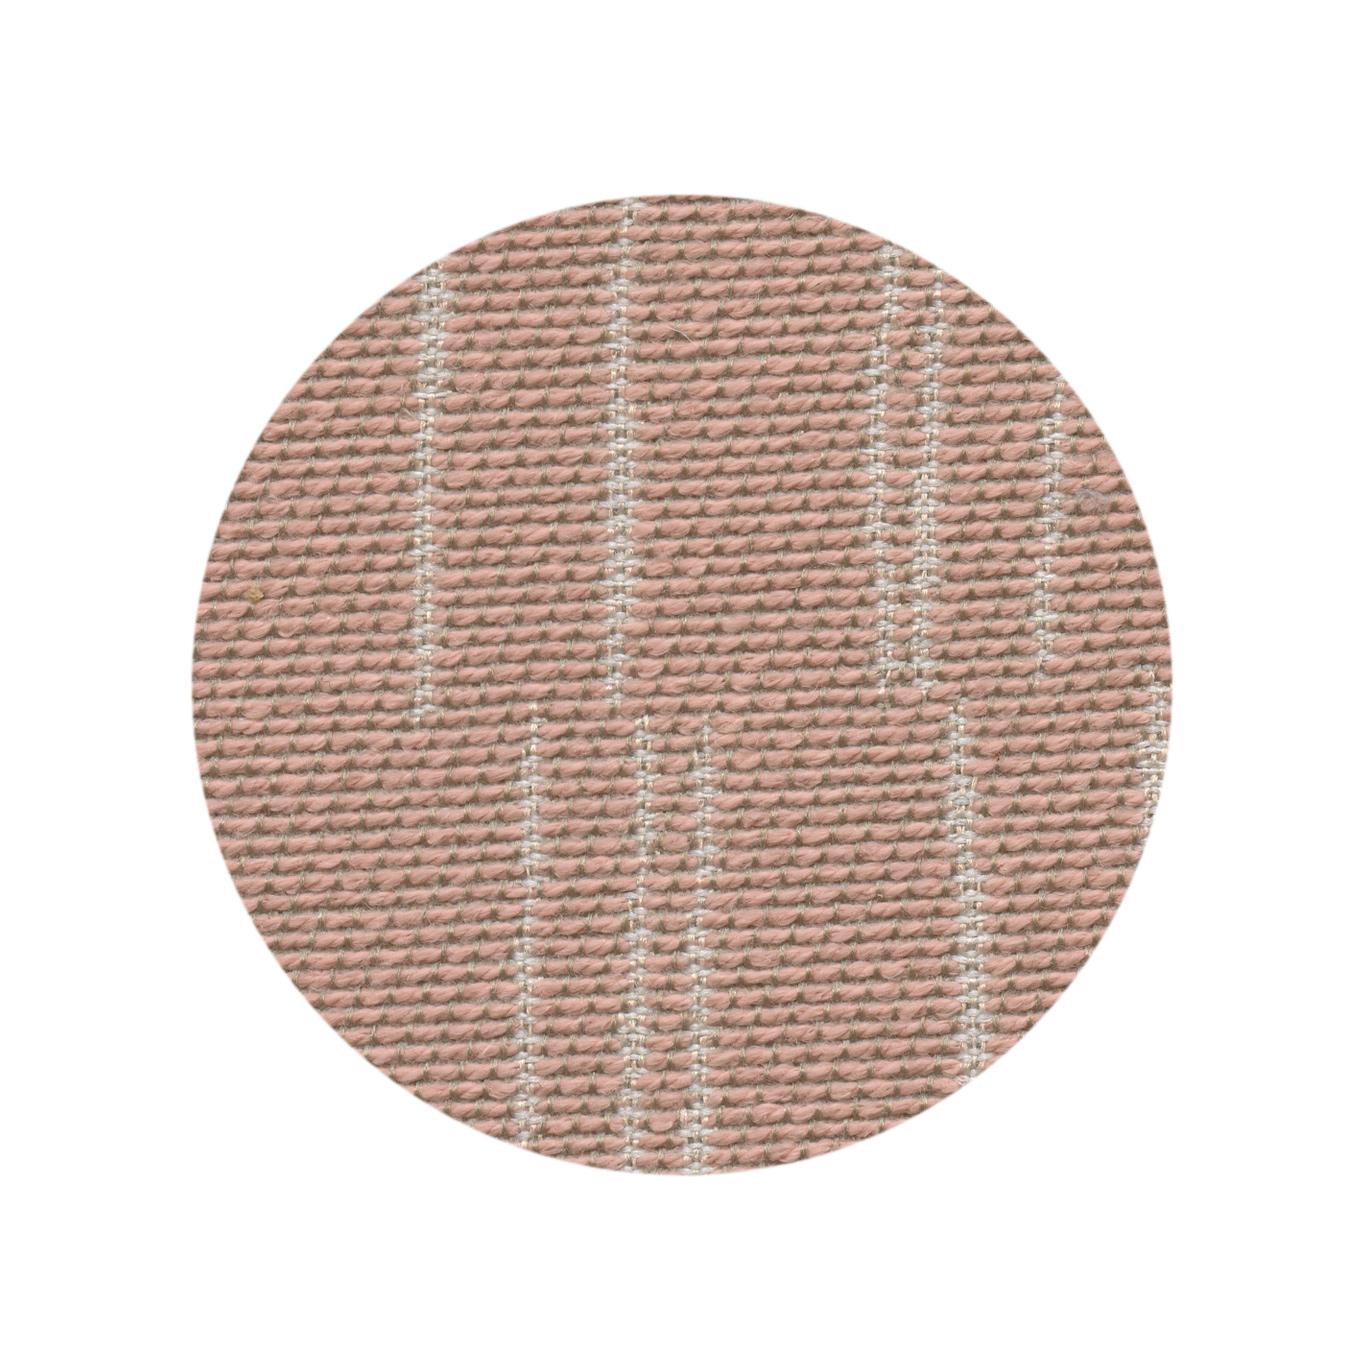 Fragmented Stripe - Misty Rose